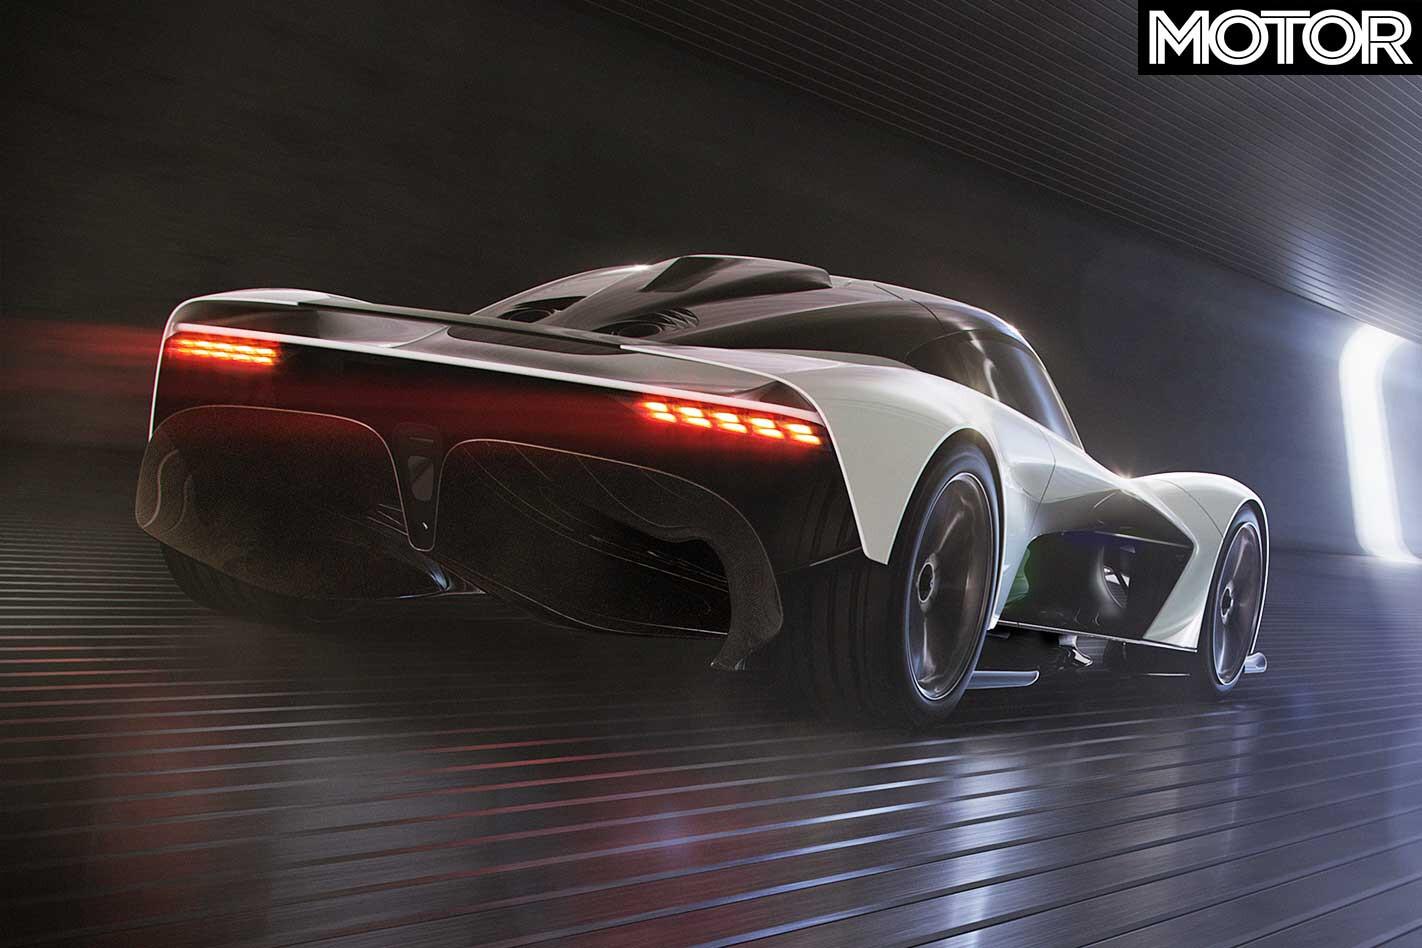 Aston Martin AMRB 003 Rear Jpg